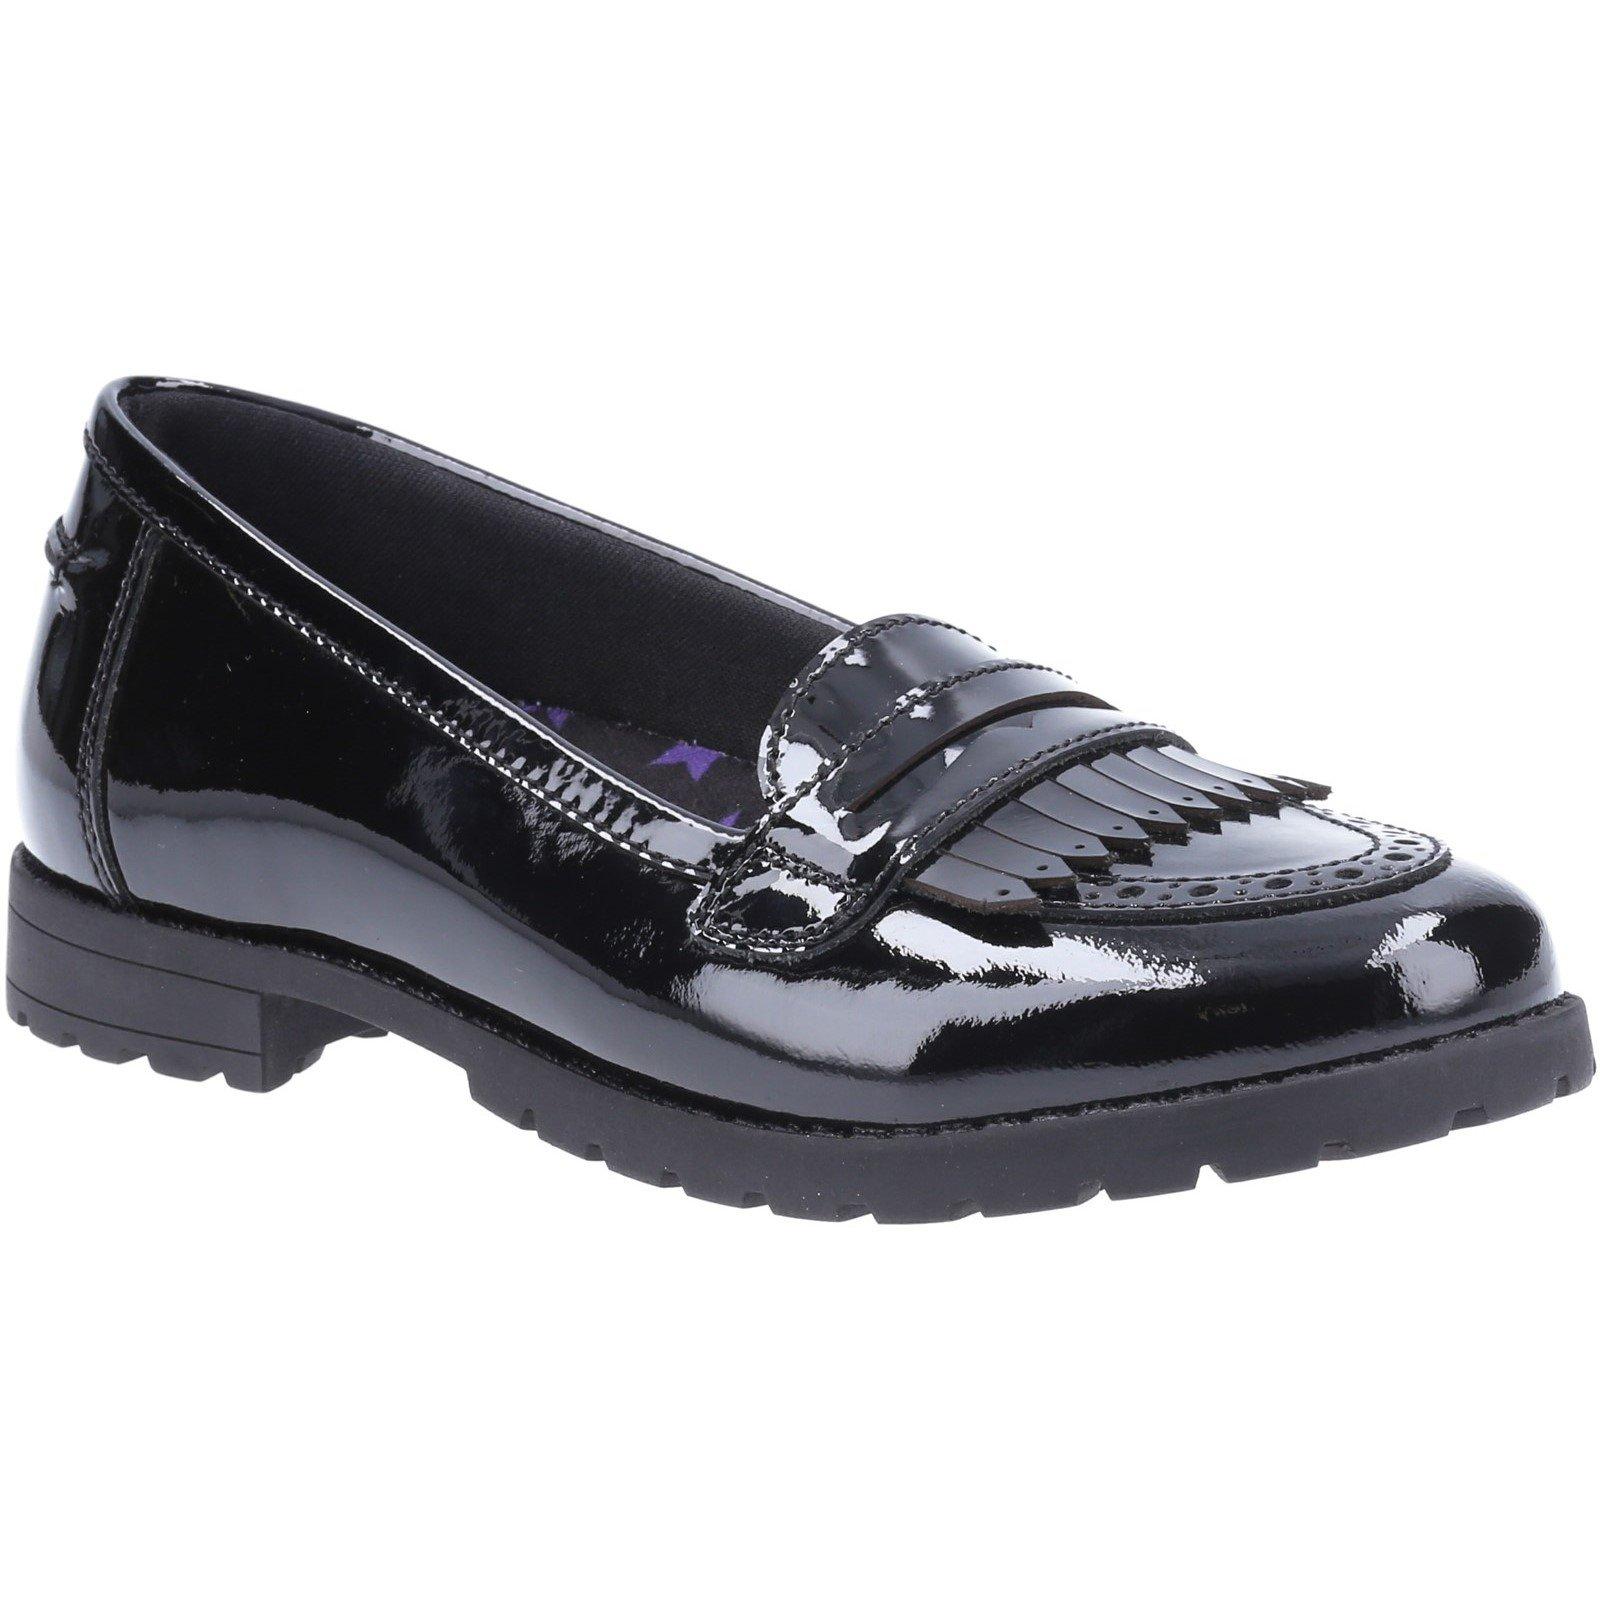 Hush Puppies Kid's Emer Junior School Shoe Patent Black 32595 - Patent Black 10